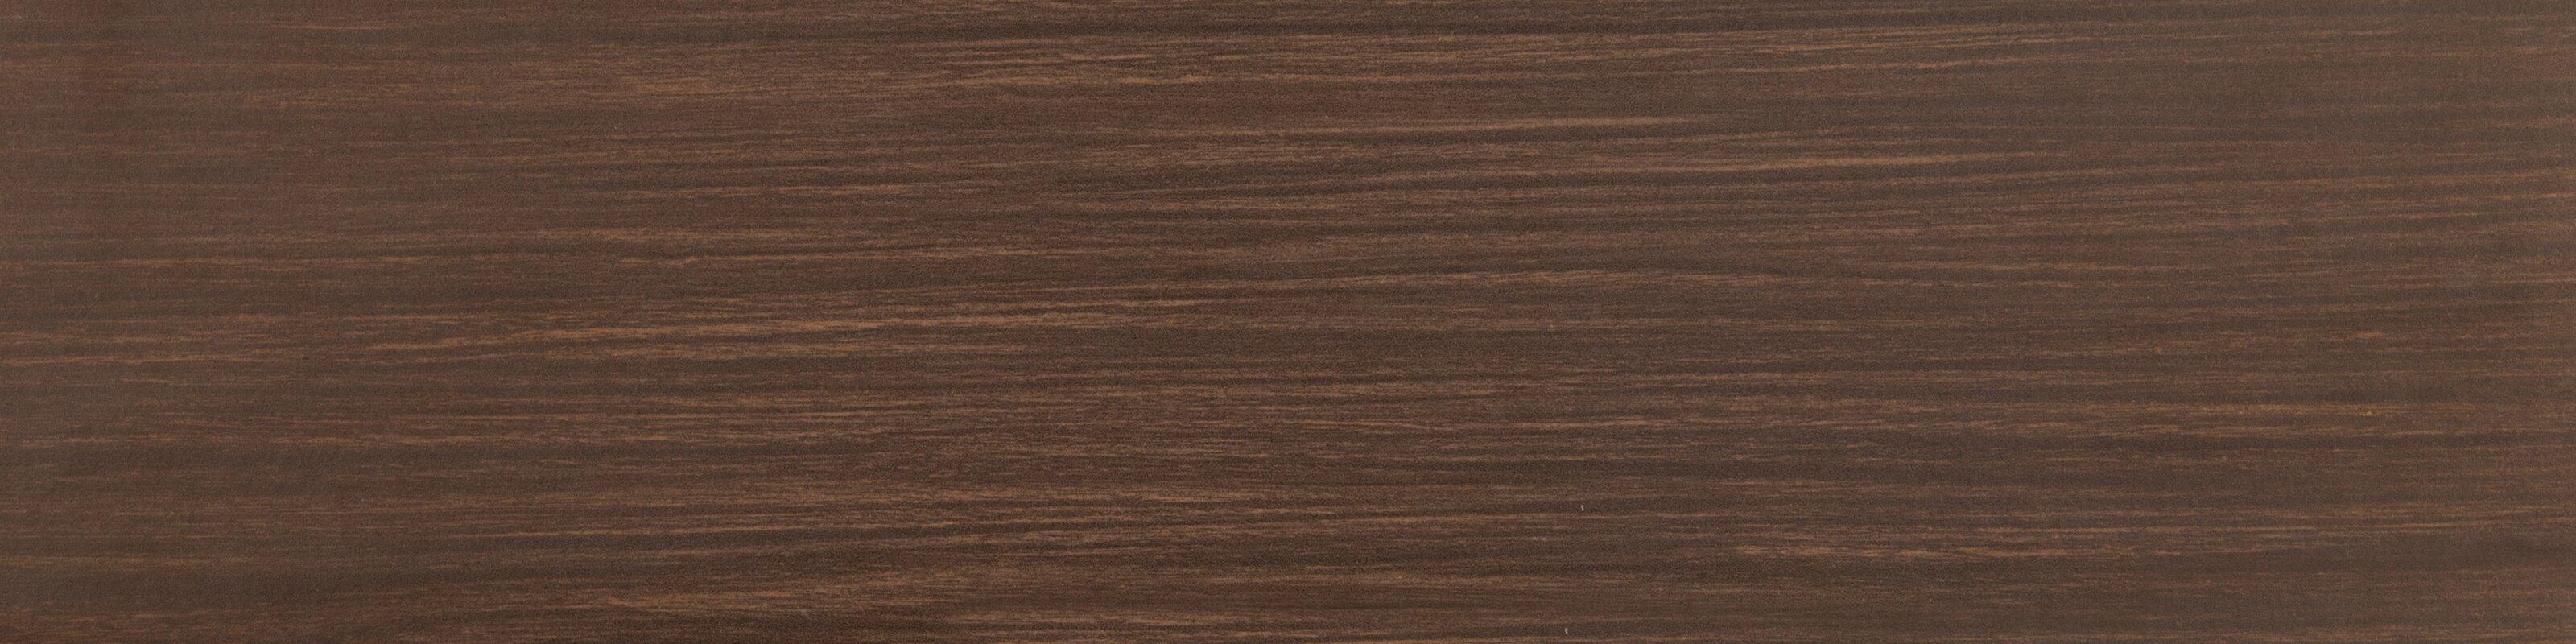 Sygma Chocolate 6 X 24 Ceramic Wood Look Tile